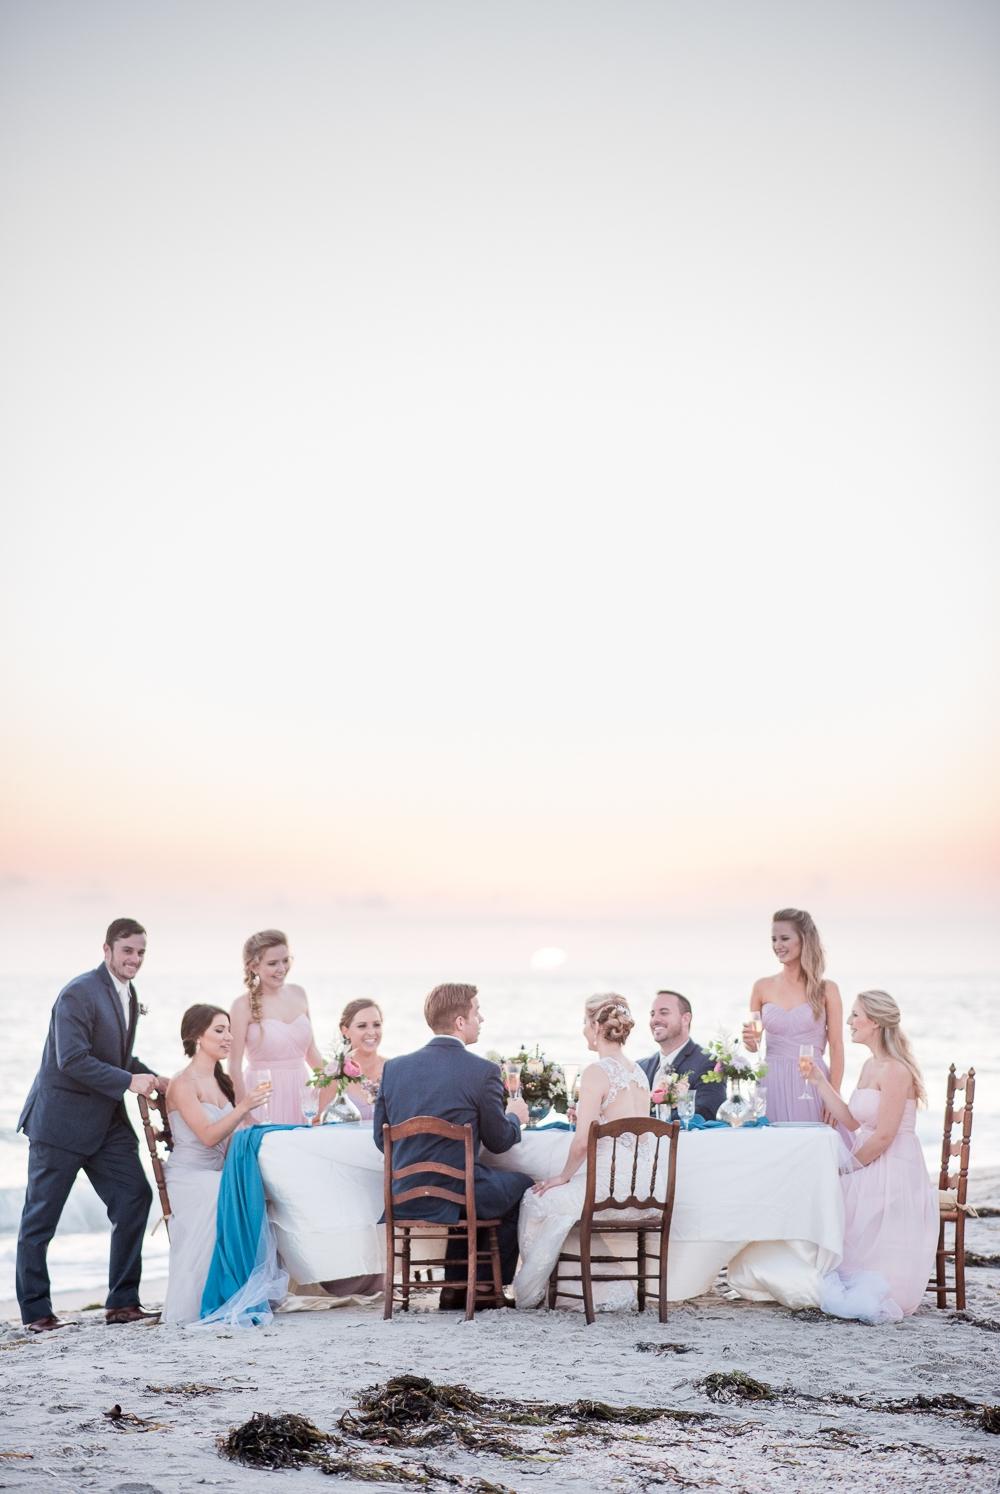 2016 HLM Wedding Beach Shoot 21.jpg